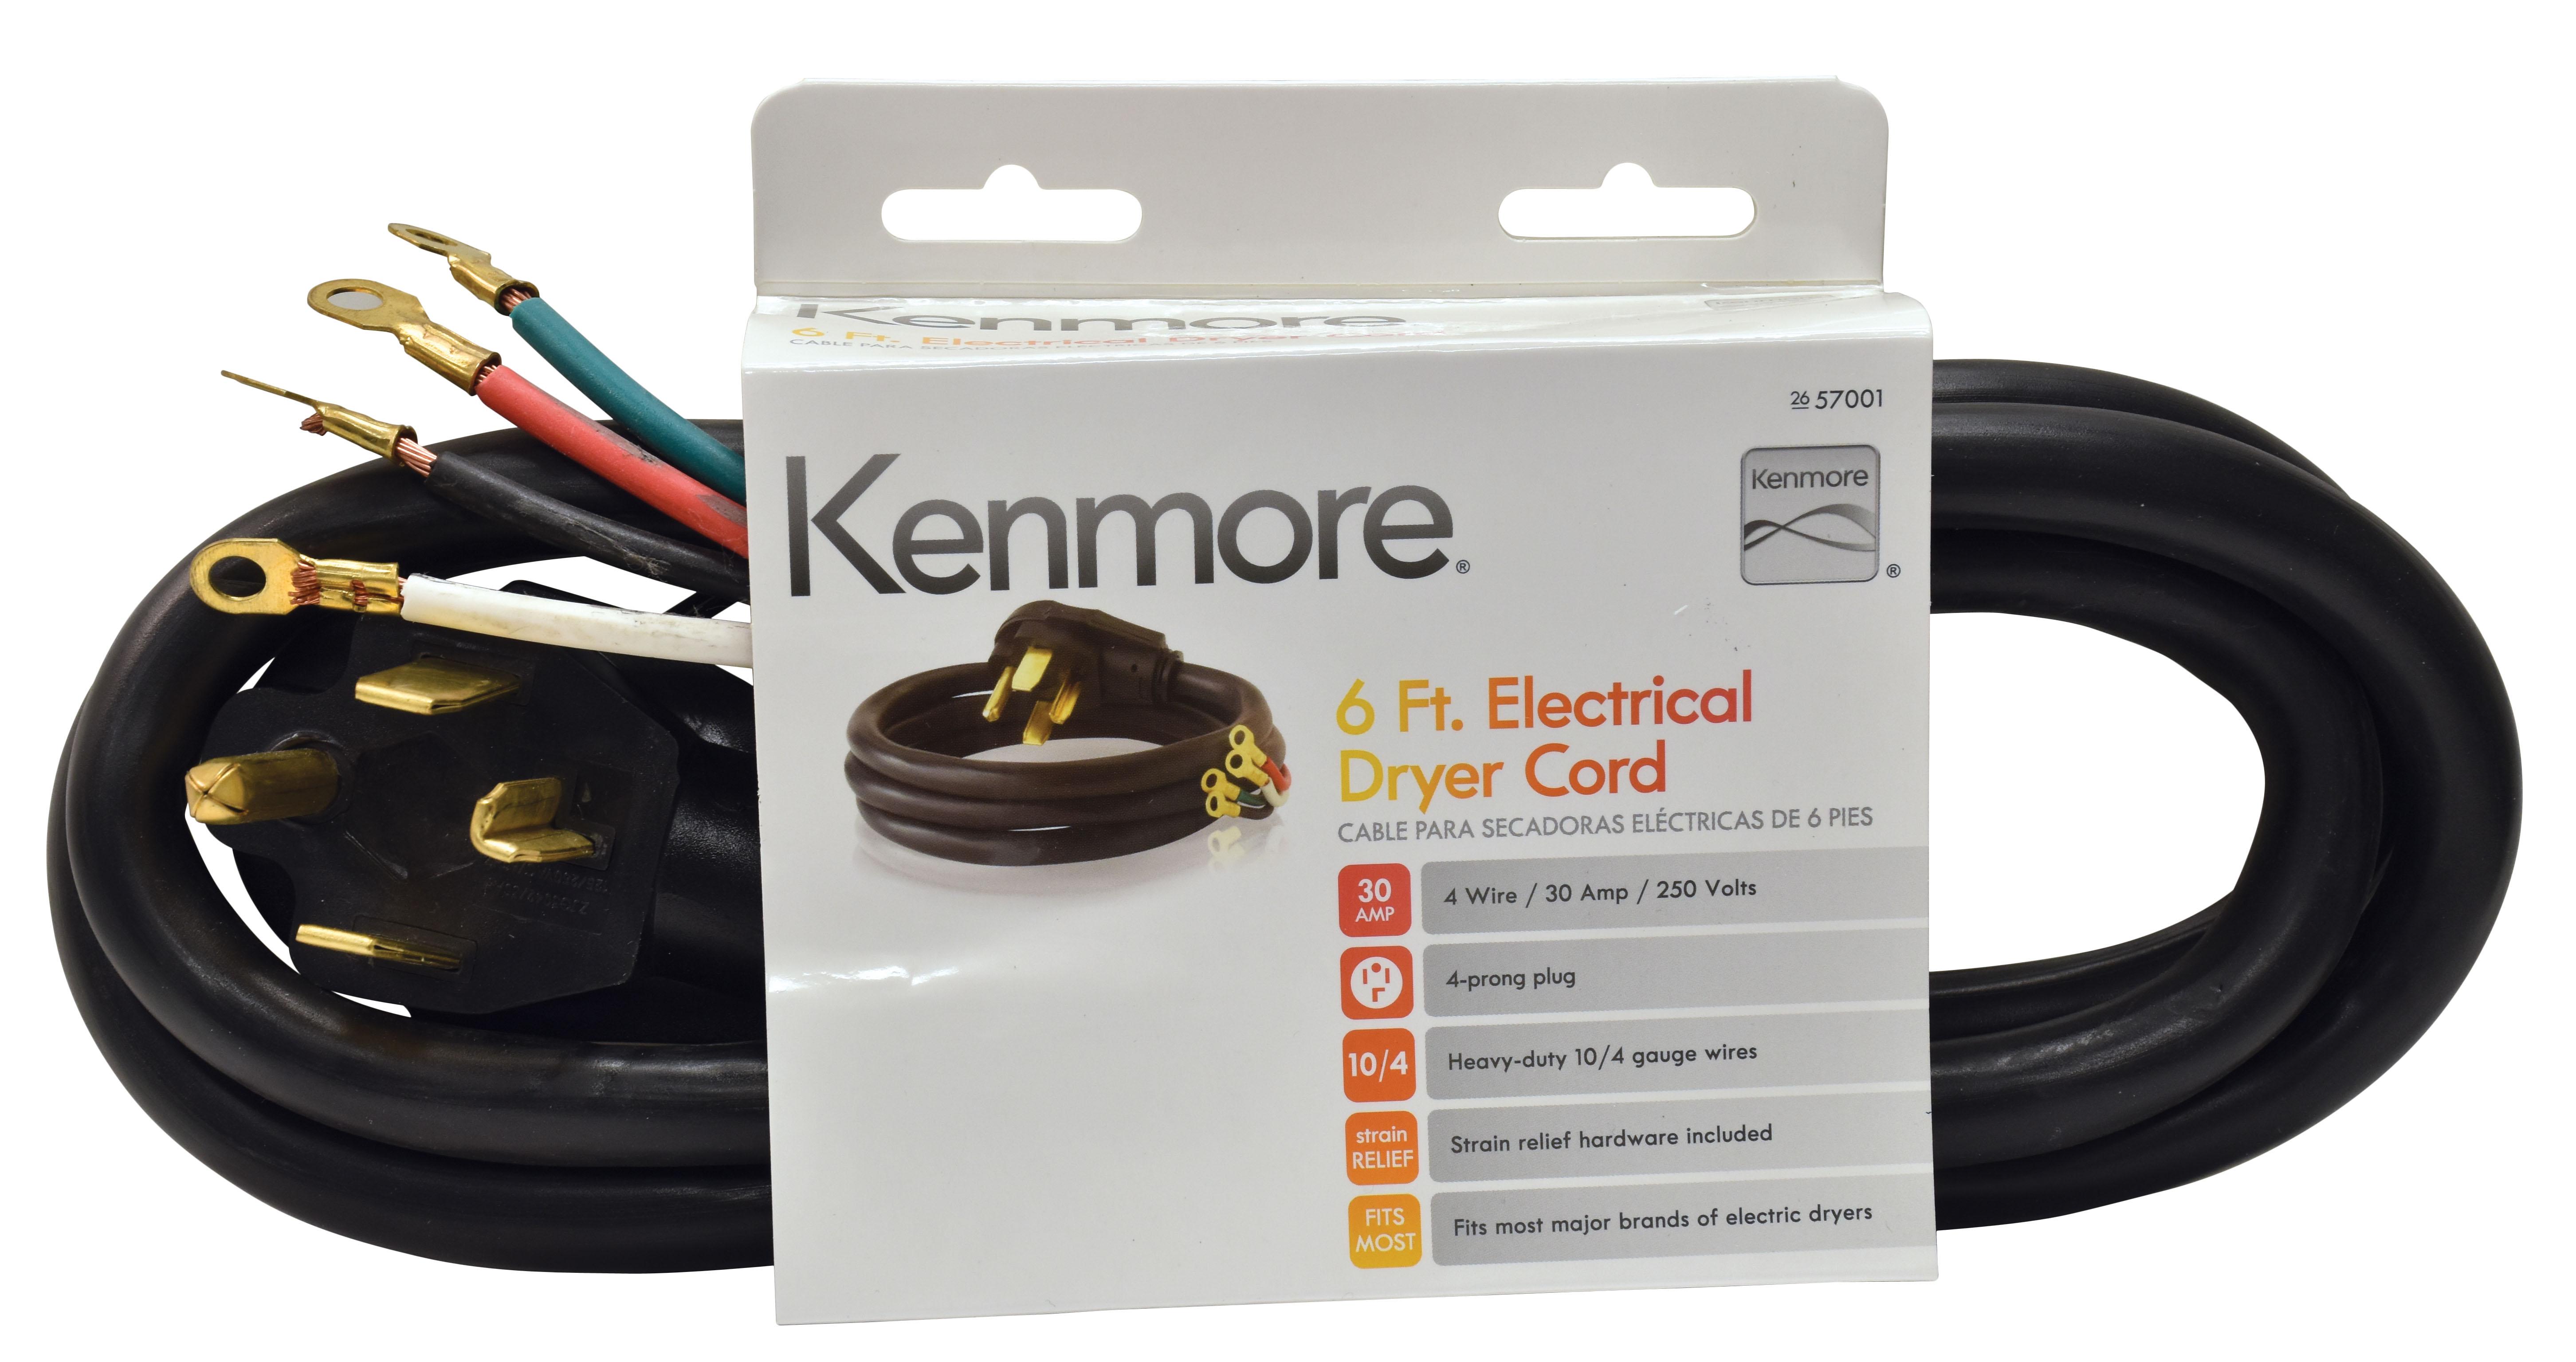 hight resolution of kenmore 99921 57001 4 prong 6 round dryer cord black kenmore elite dryer diagram sears kenmore dryer wiring diagram